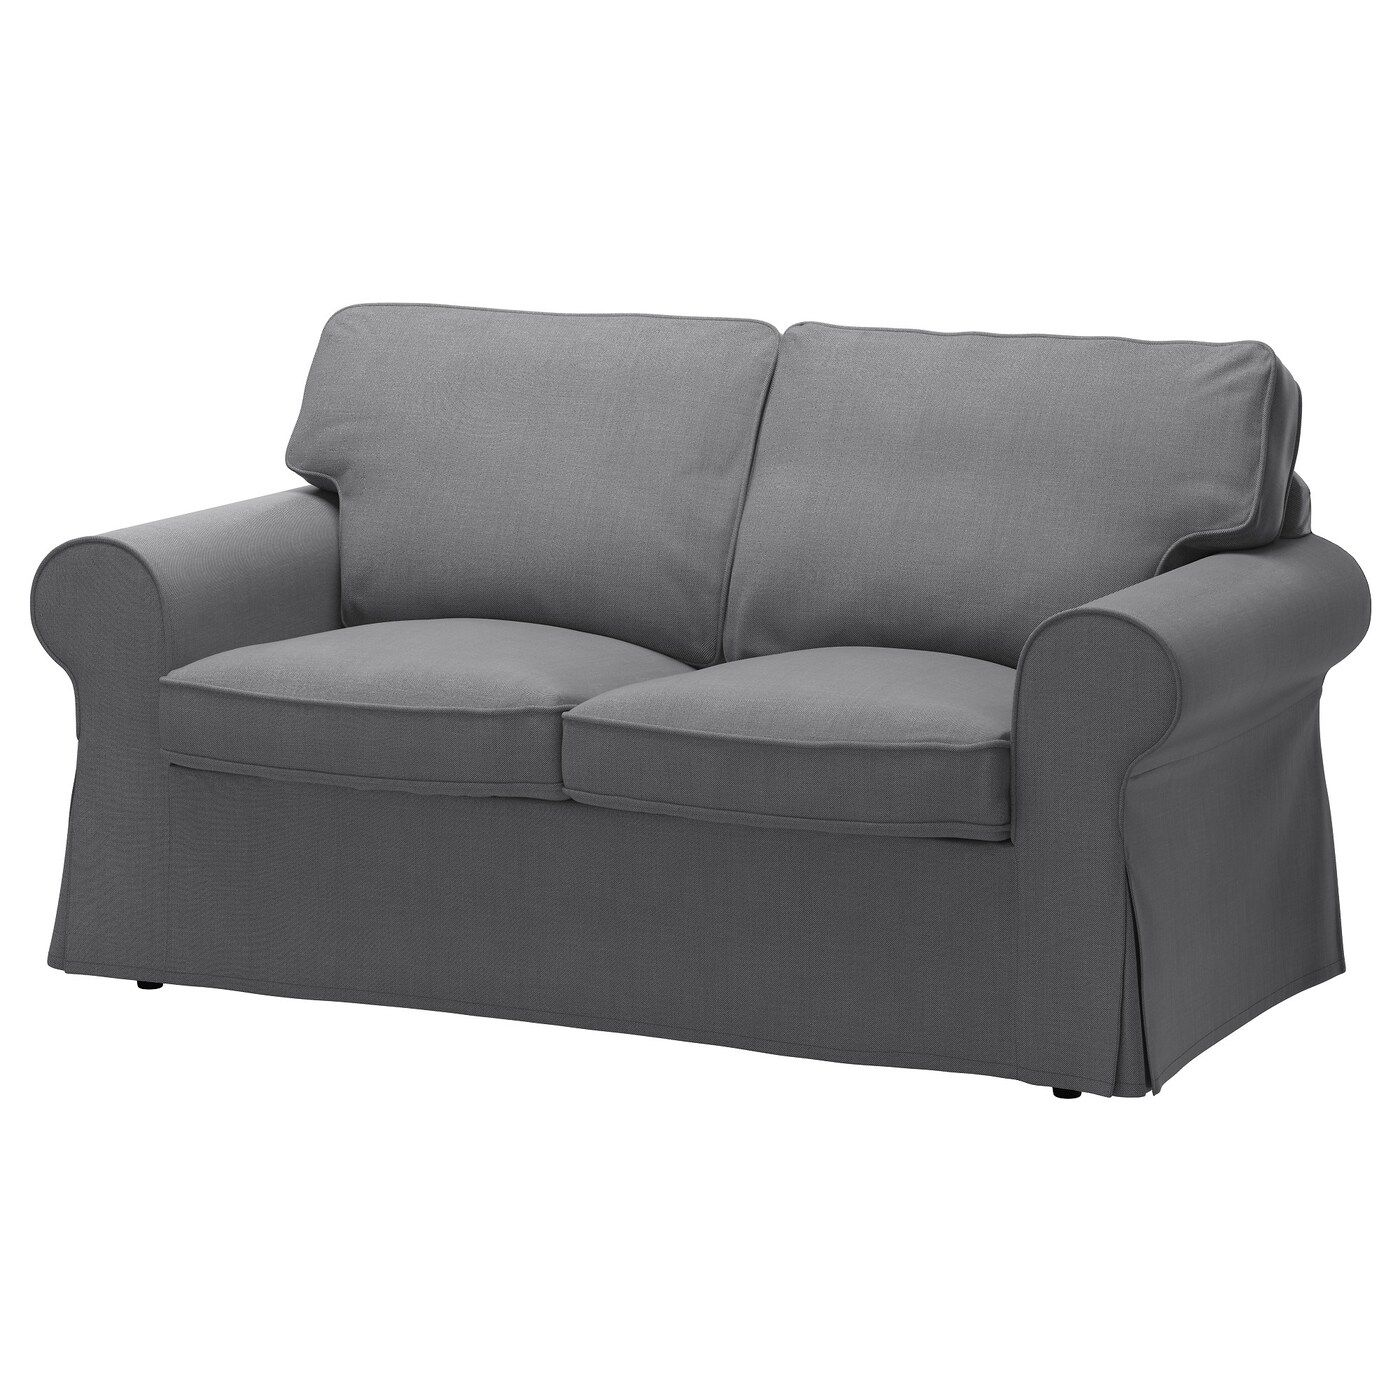 Ektorp Hoes 2 Zitsbank In 2020 Loveseat Covers Love Seat Ikea Sofa